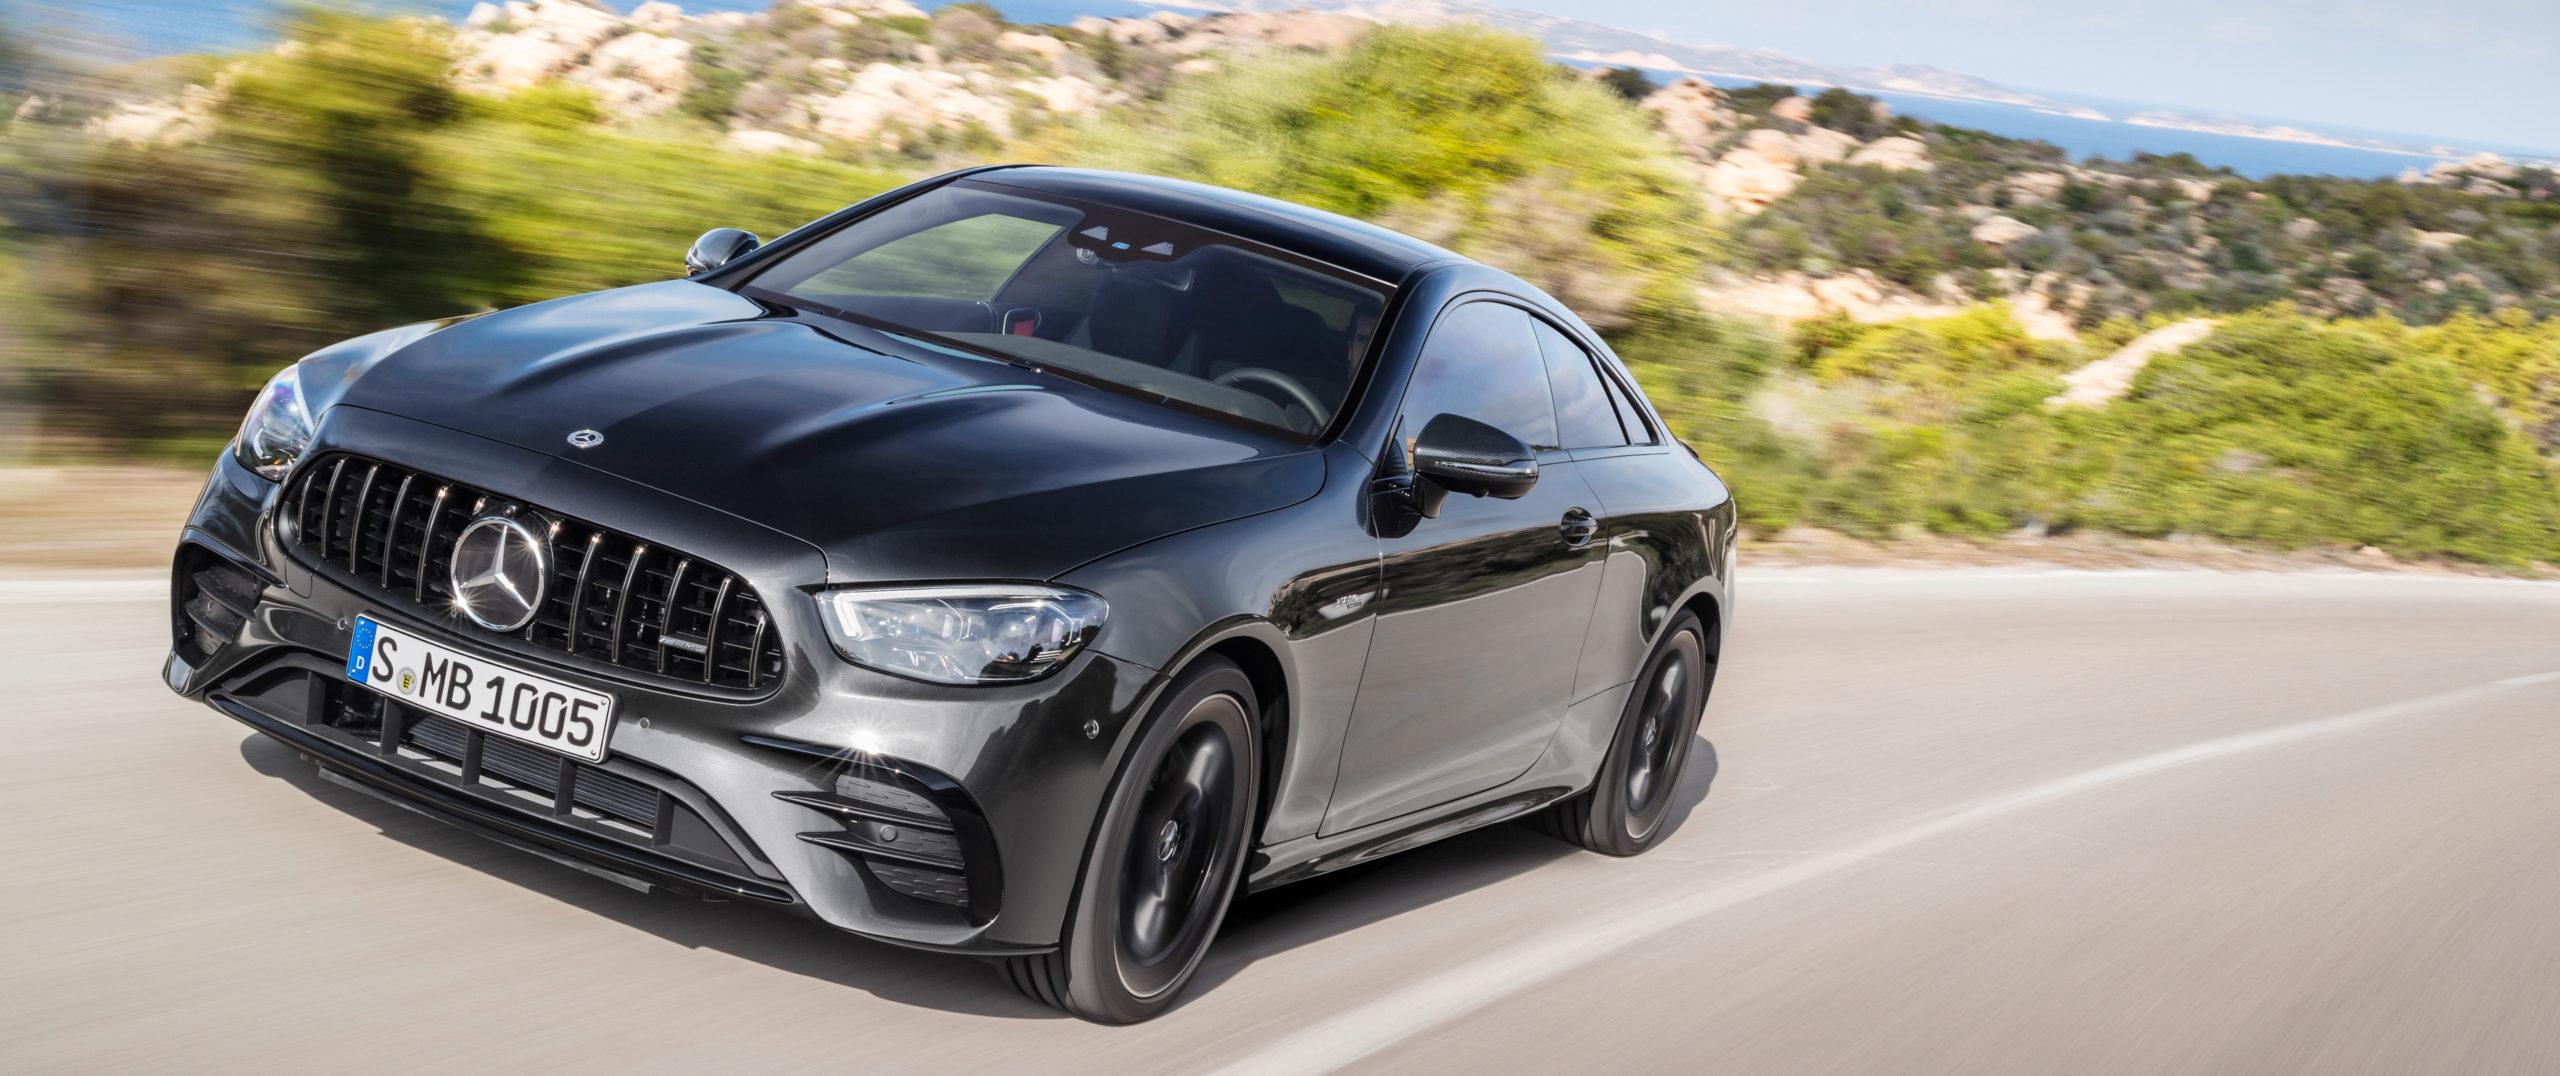 Ya se admiten pedidos del Mercedes-Benz AMG E53 4MATIC+ Coupé y Cabrio